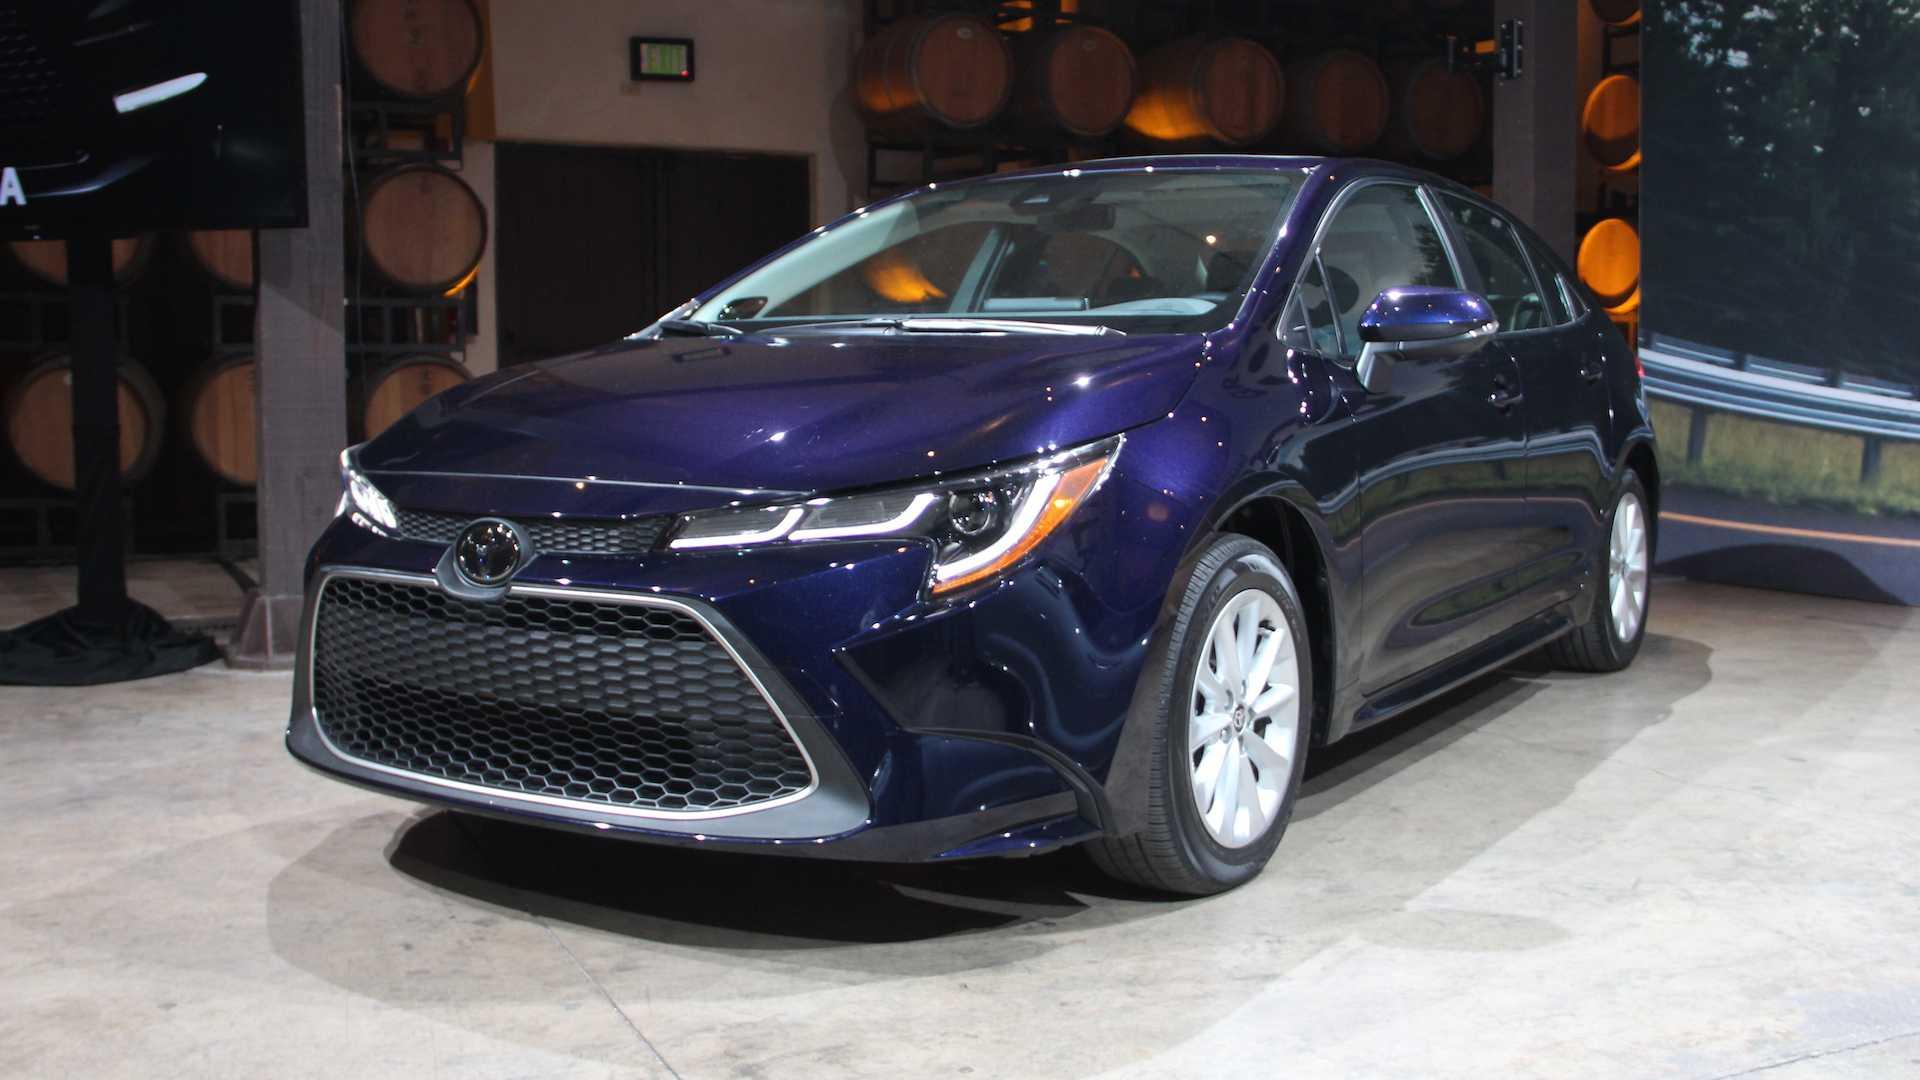 39 Great Toyota Gli 2020 Performance and New Engine for Toyota Gli 2020